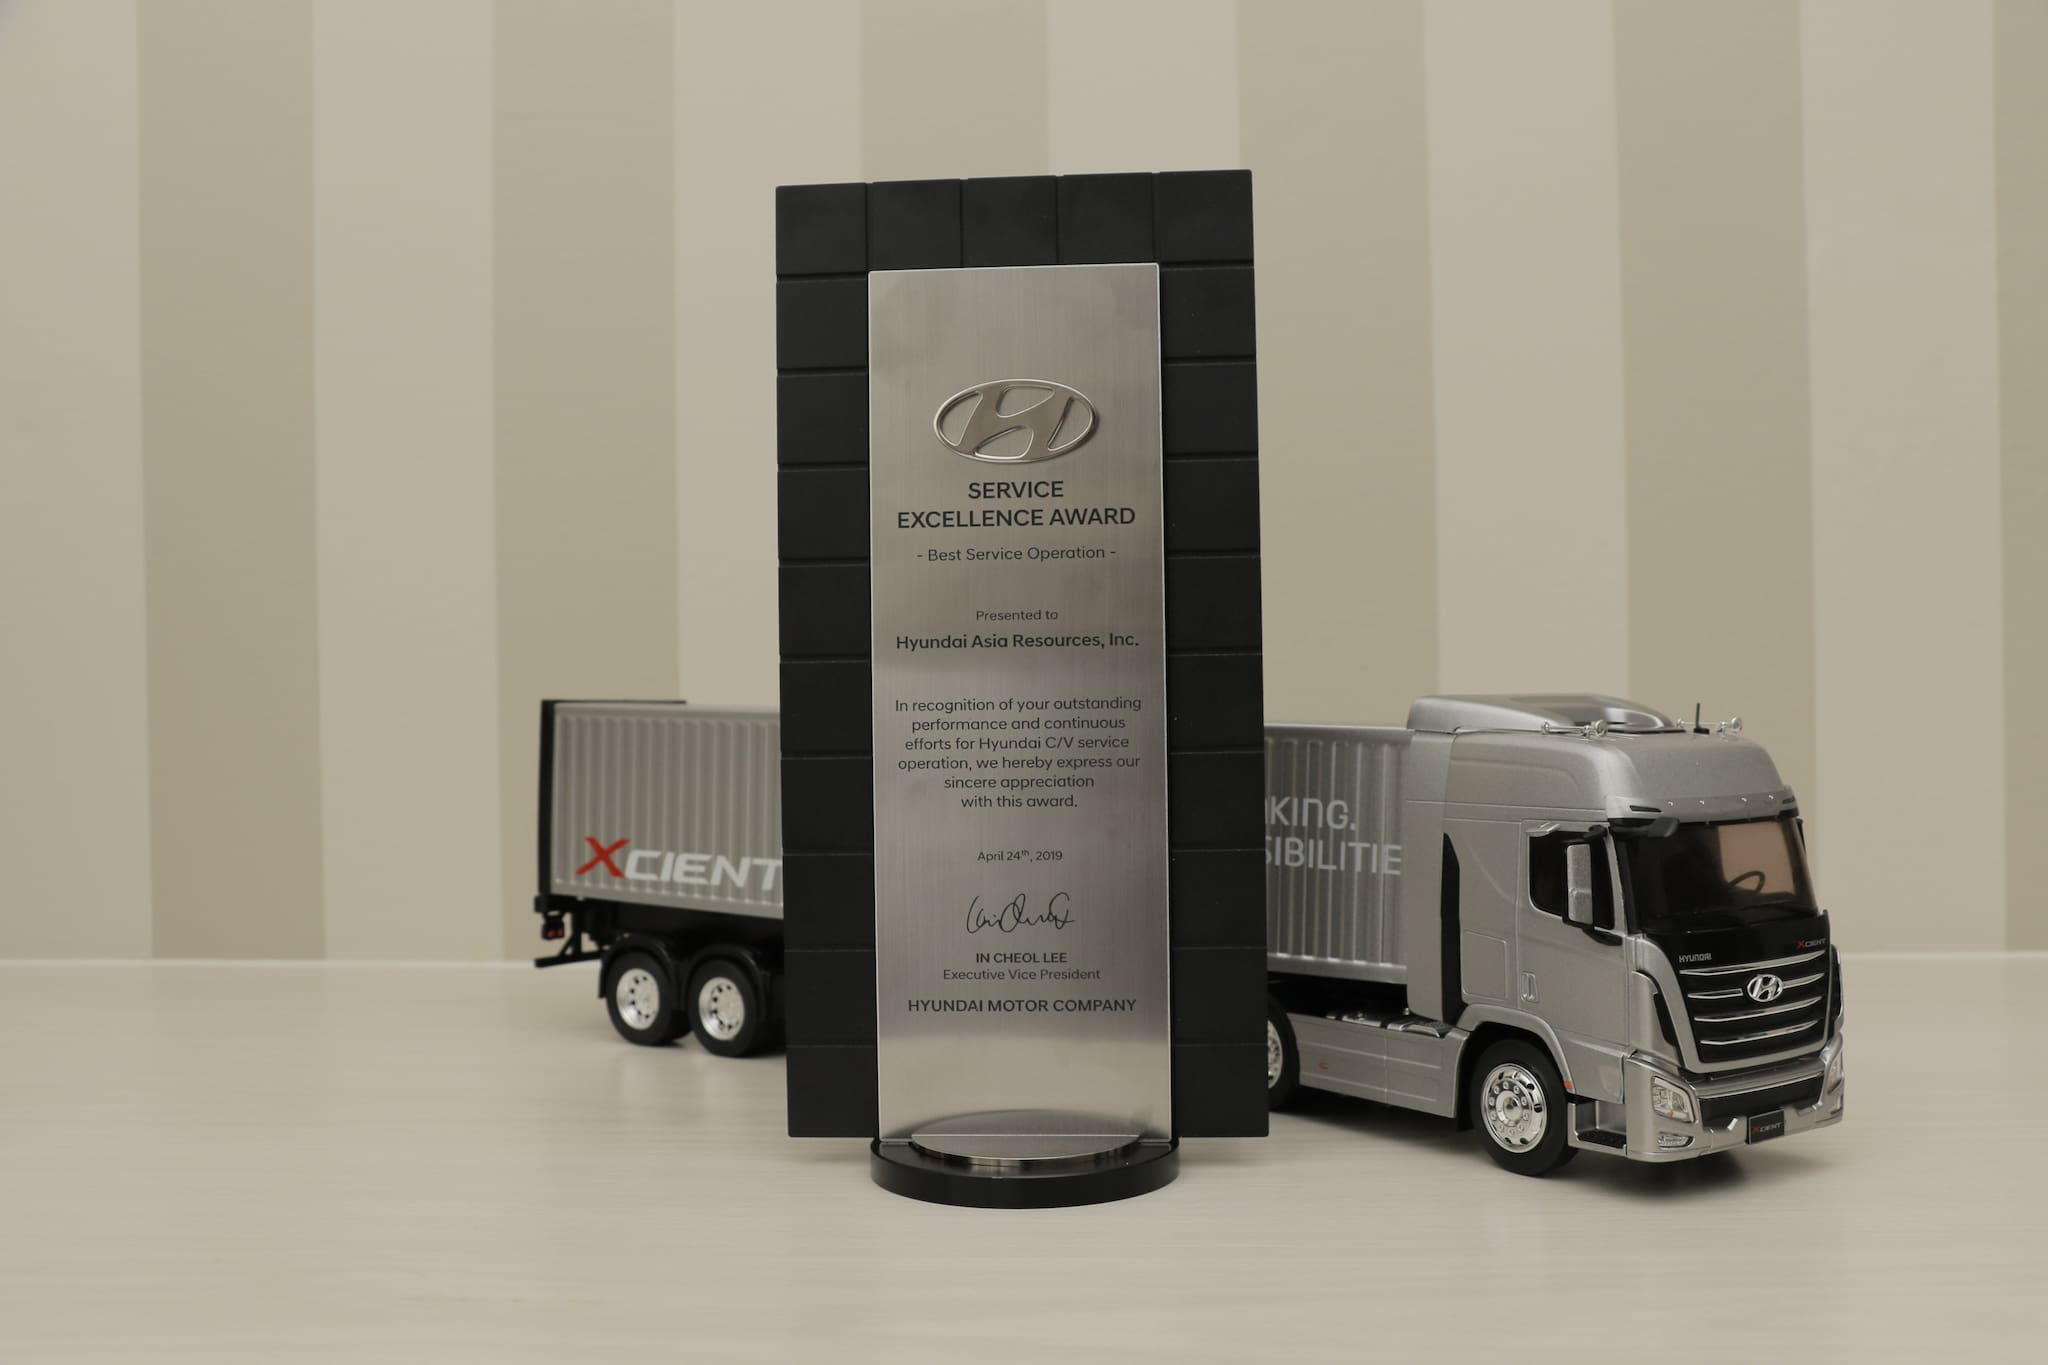 Hyundai PH Wins Service Excellence Award at Global CV Service Conference